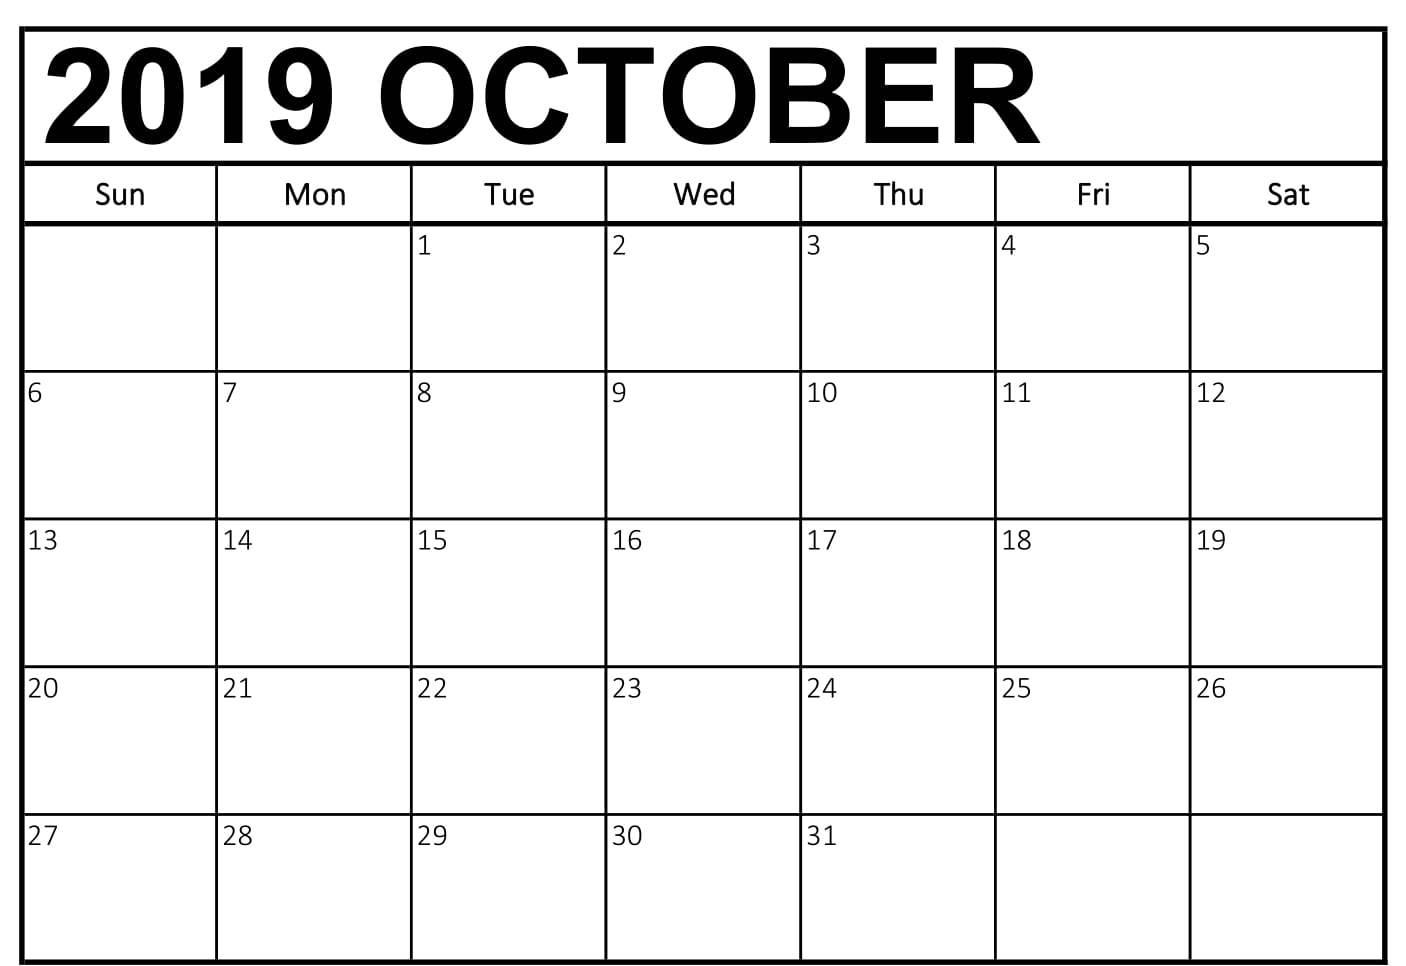 free october 2019 calendar